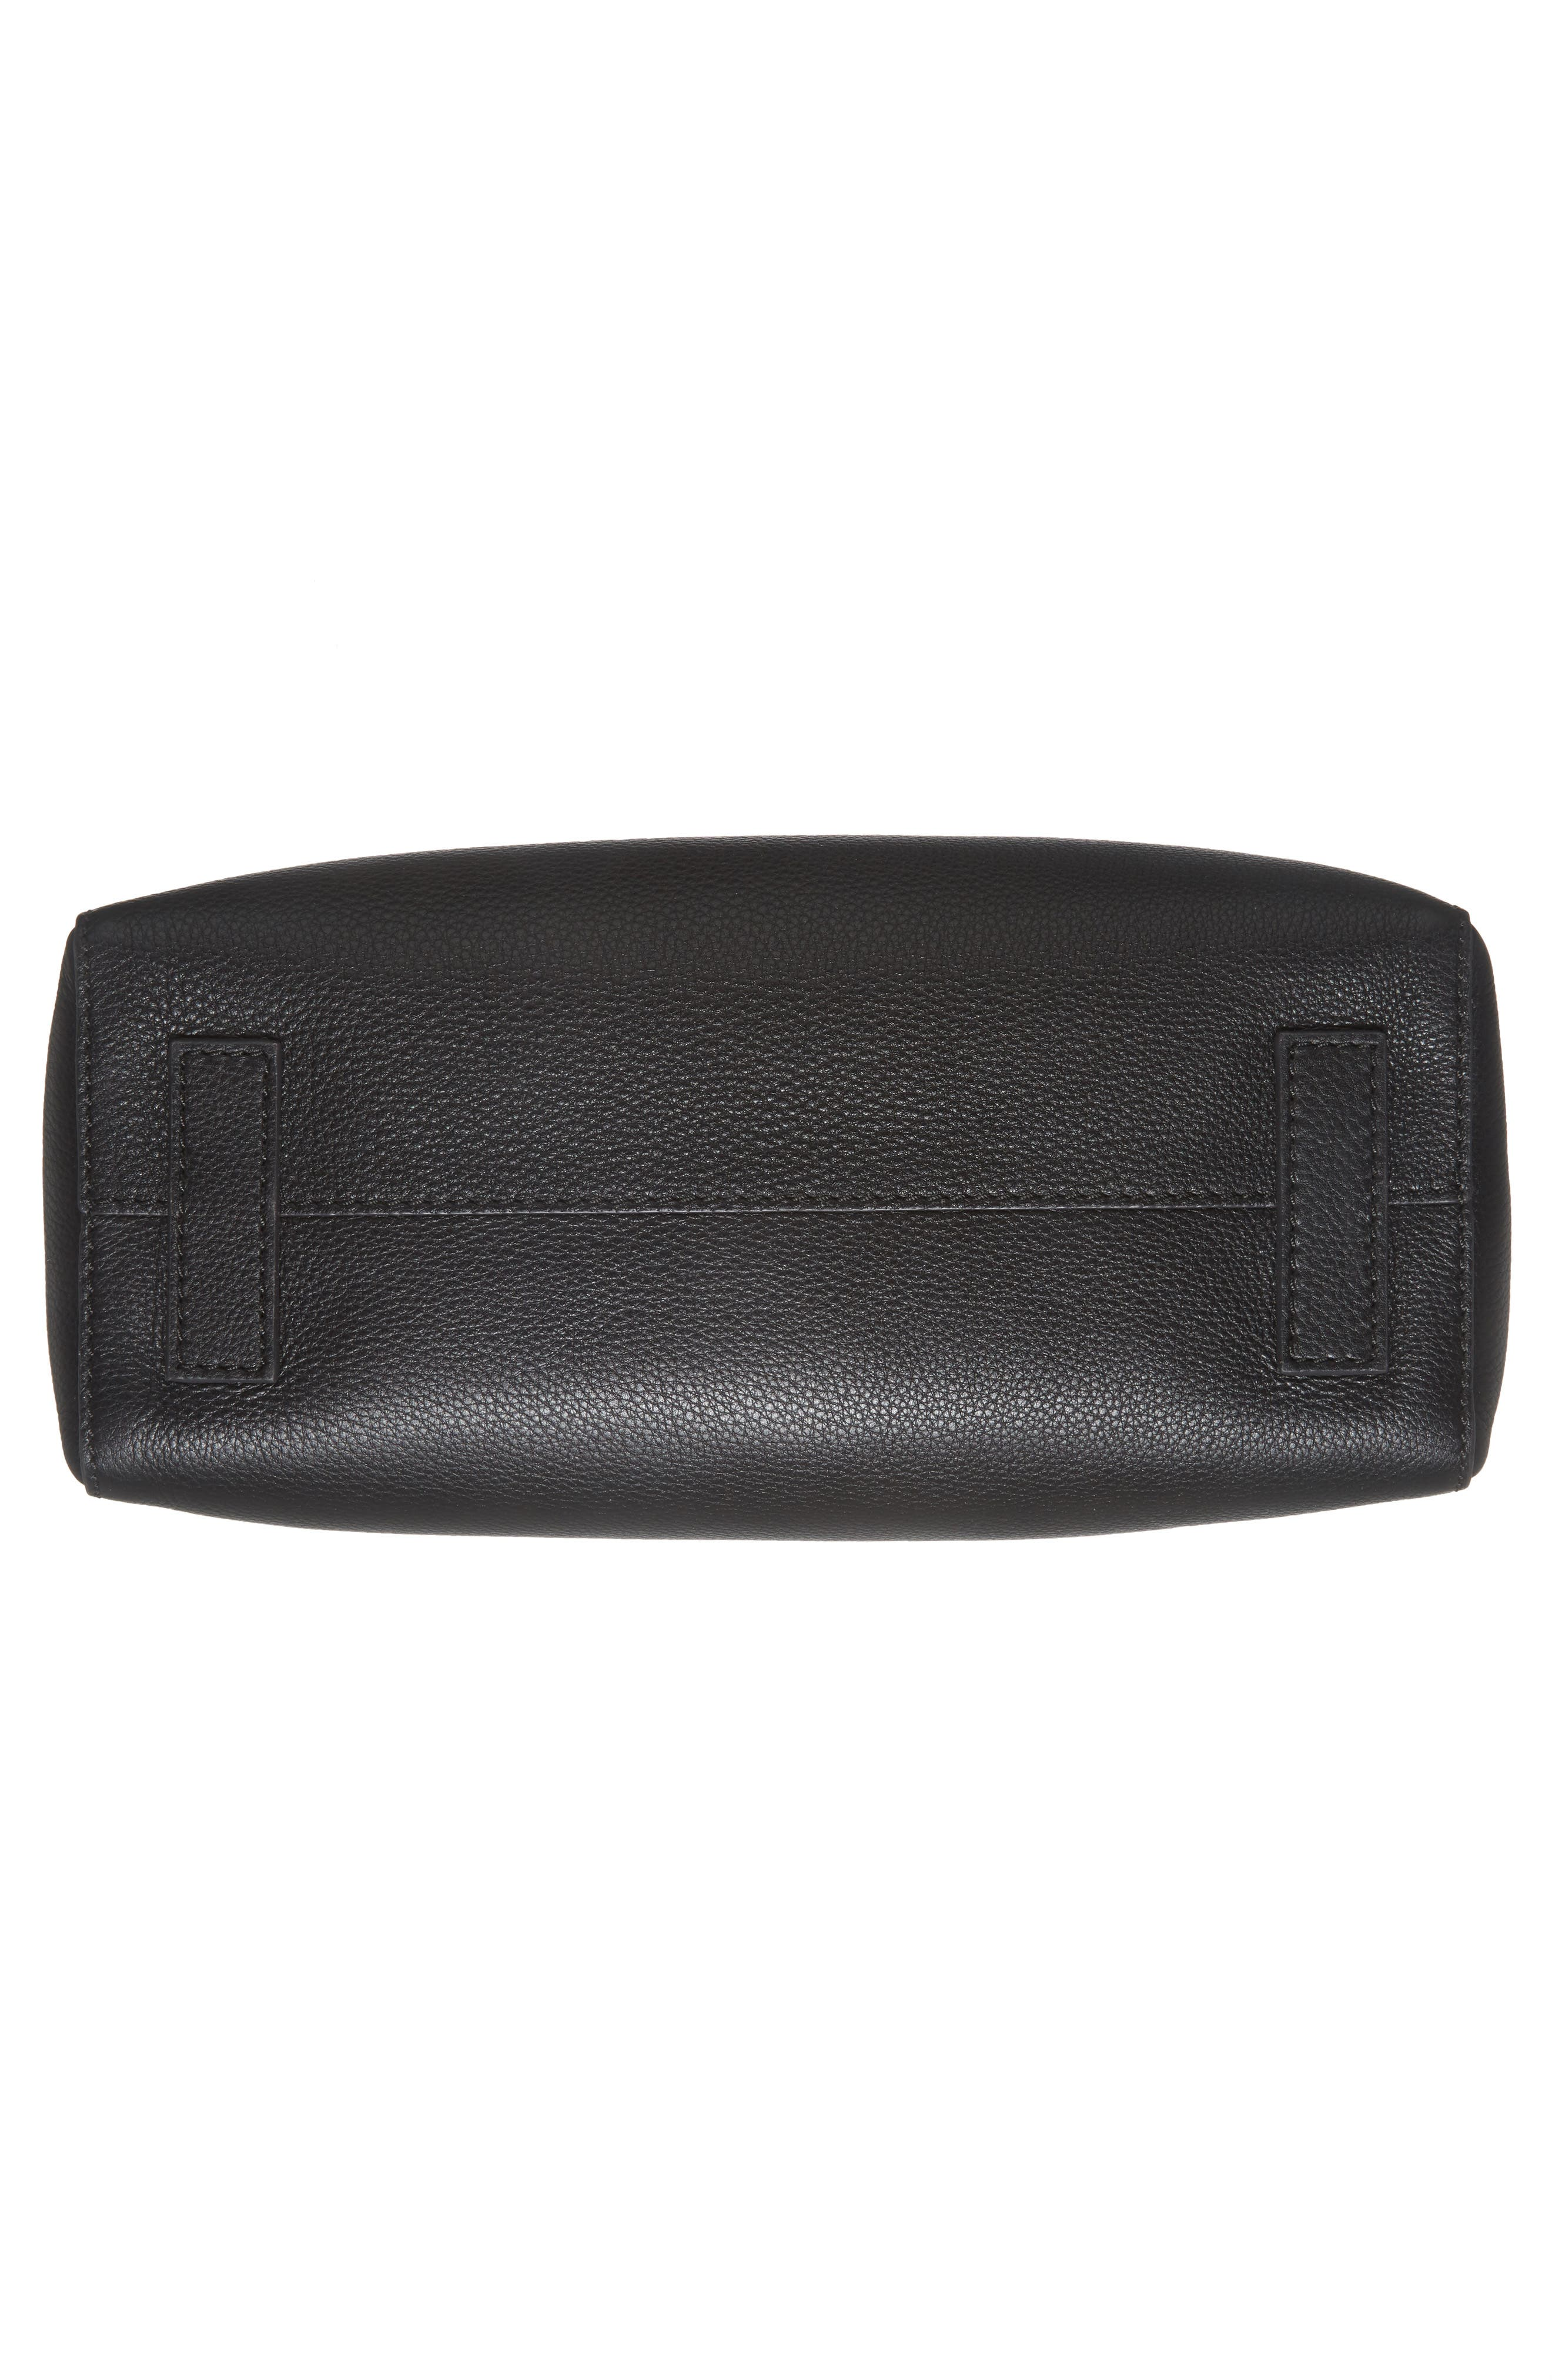 McGraw Leather Hobo,                             Alternate thumbnail 6, color,                             BLACK